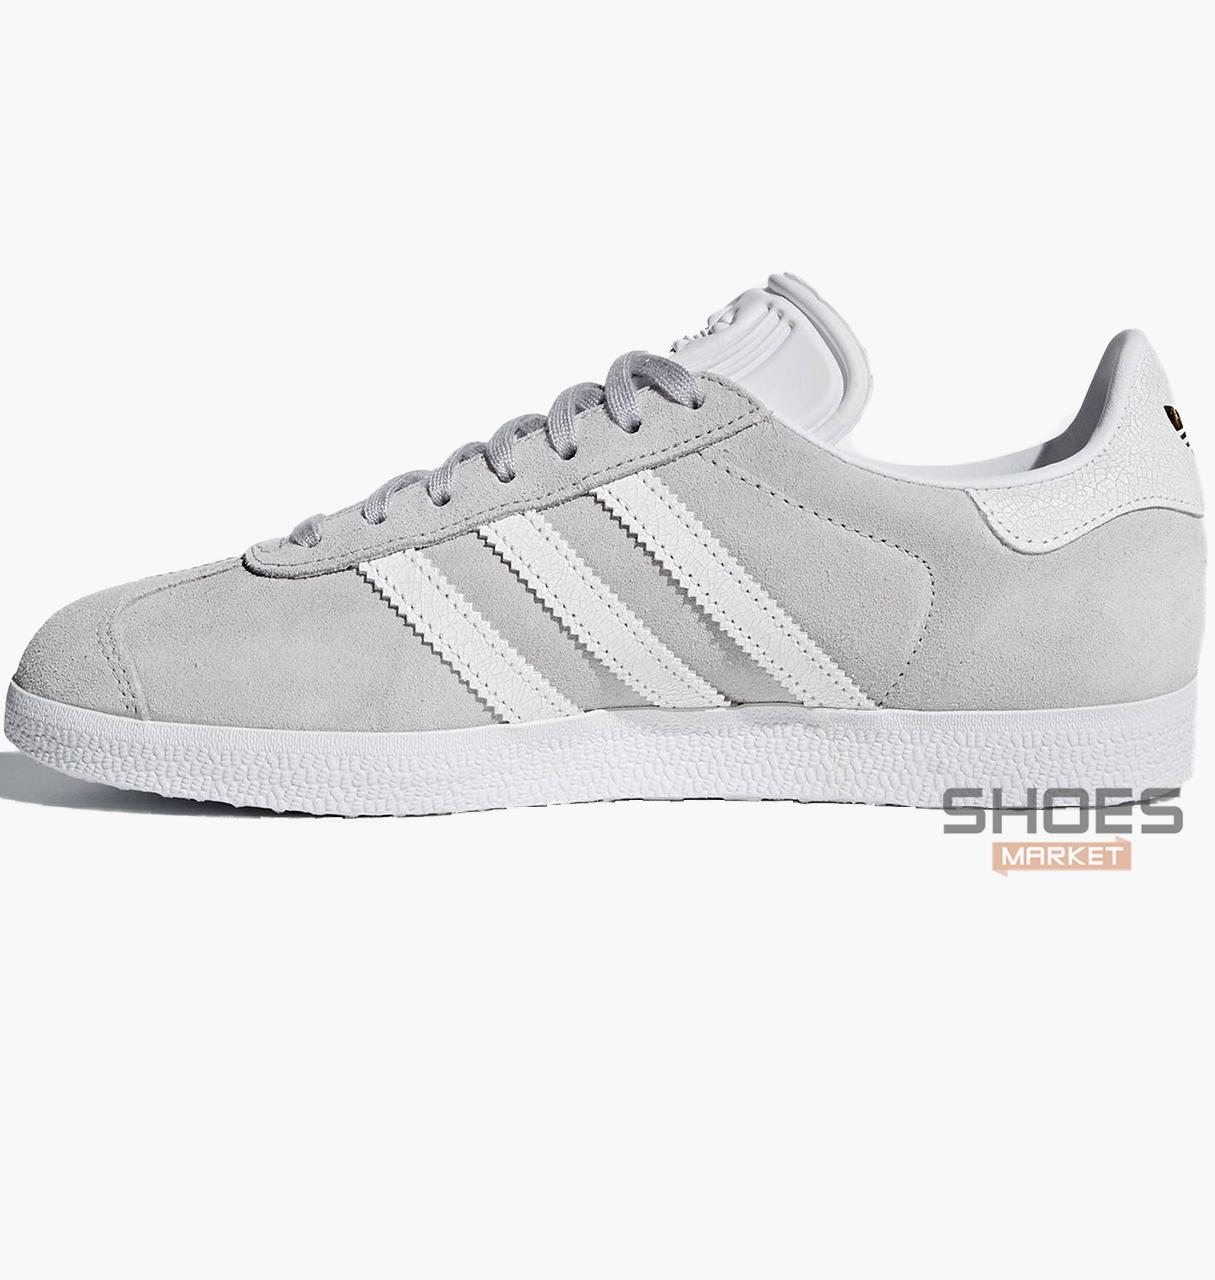 Мужские кроссовки  Adidas Gazelle W Gray B41659 , оригинал